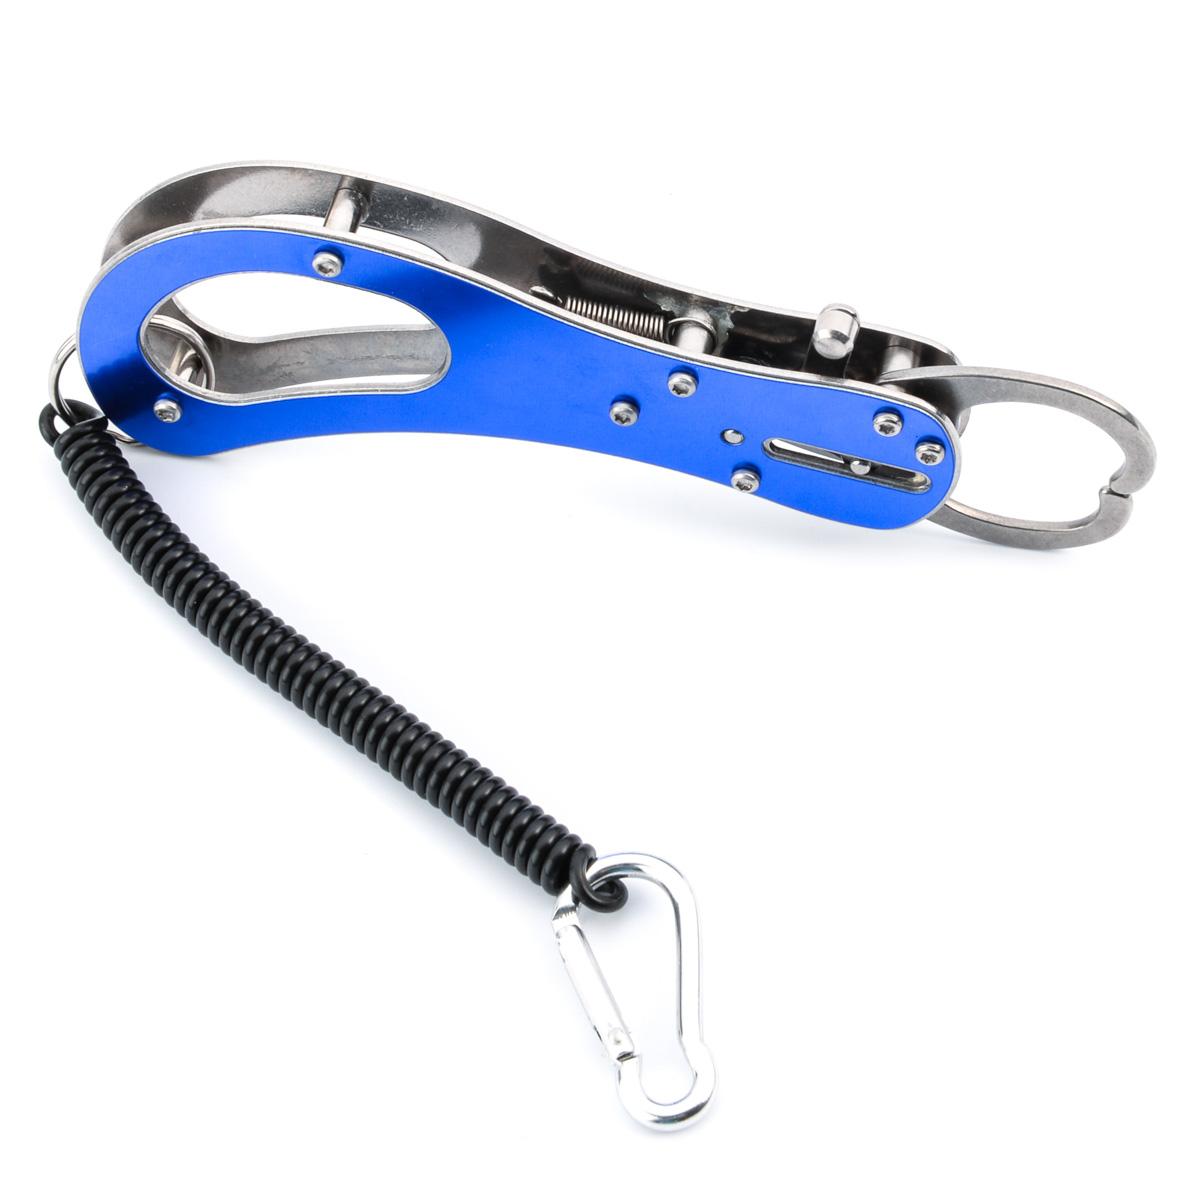 Stylish Steel Portable Fish Lip Grabber Catch Fishing Gripper Grip Tool Fishing accessories YC143-SZ